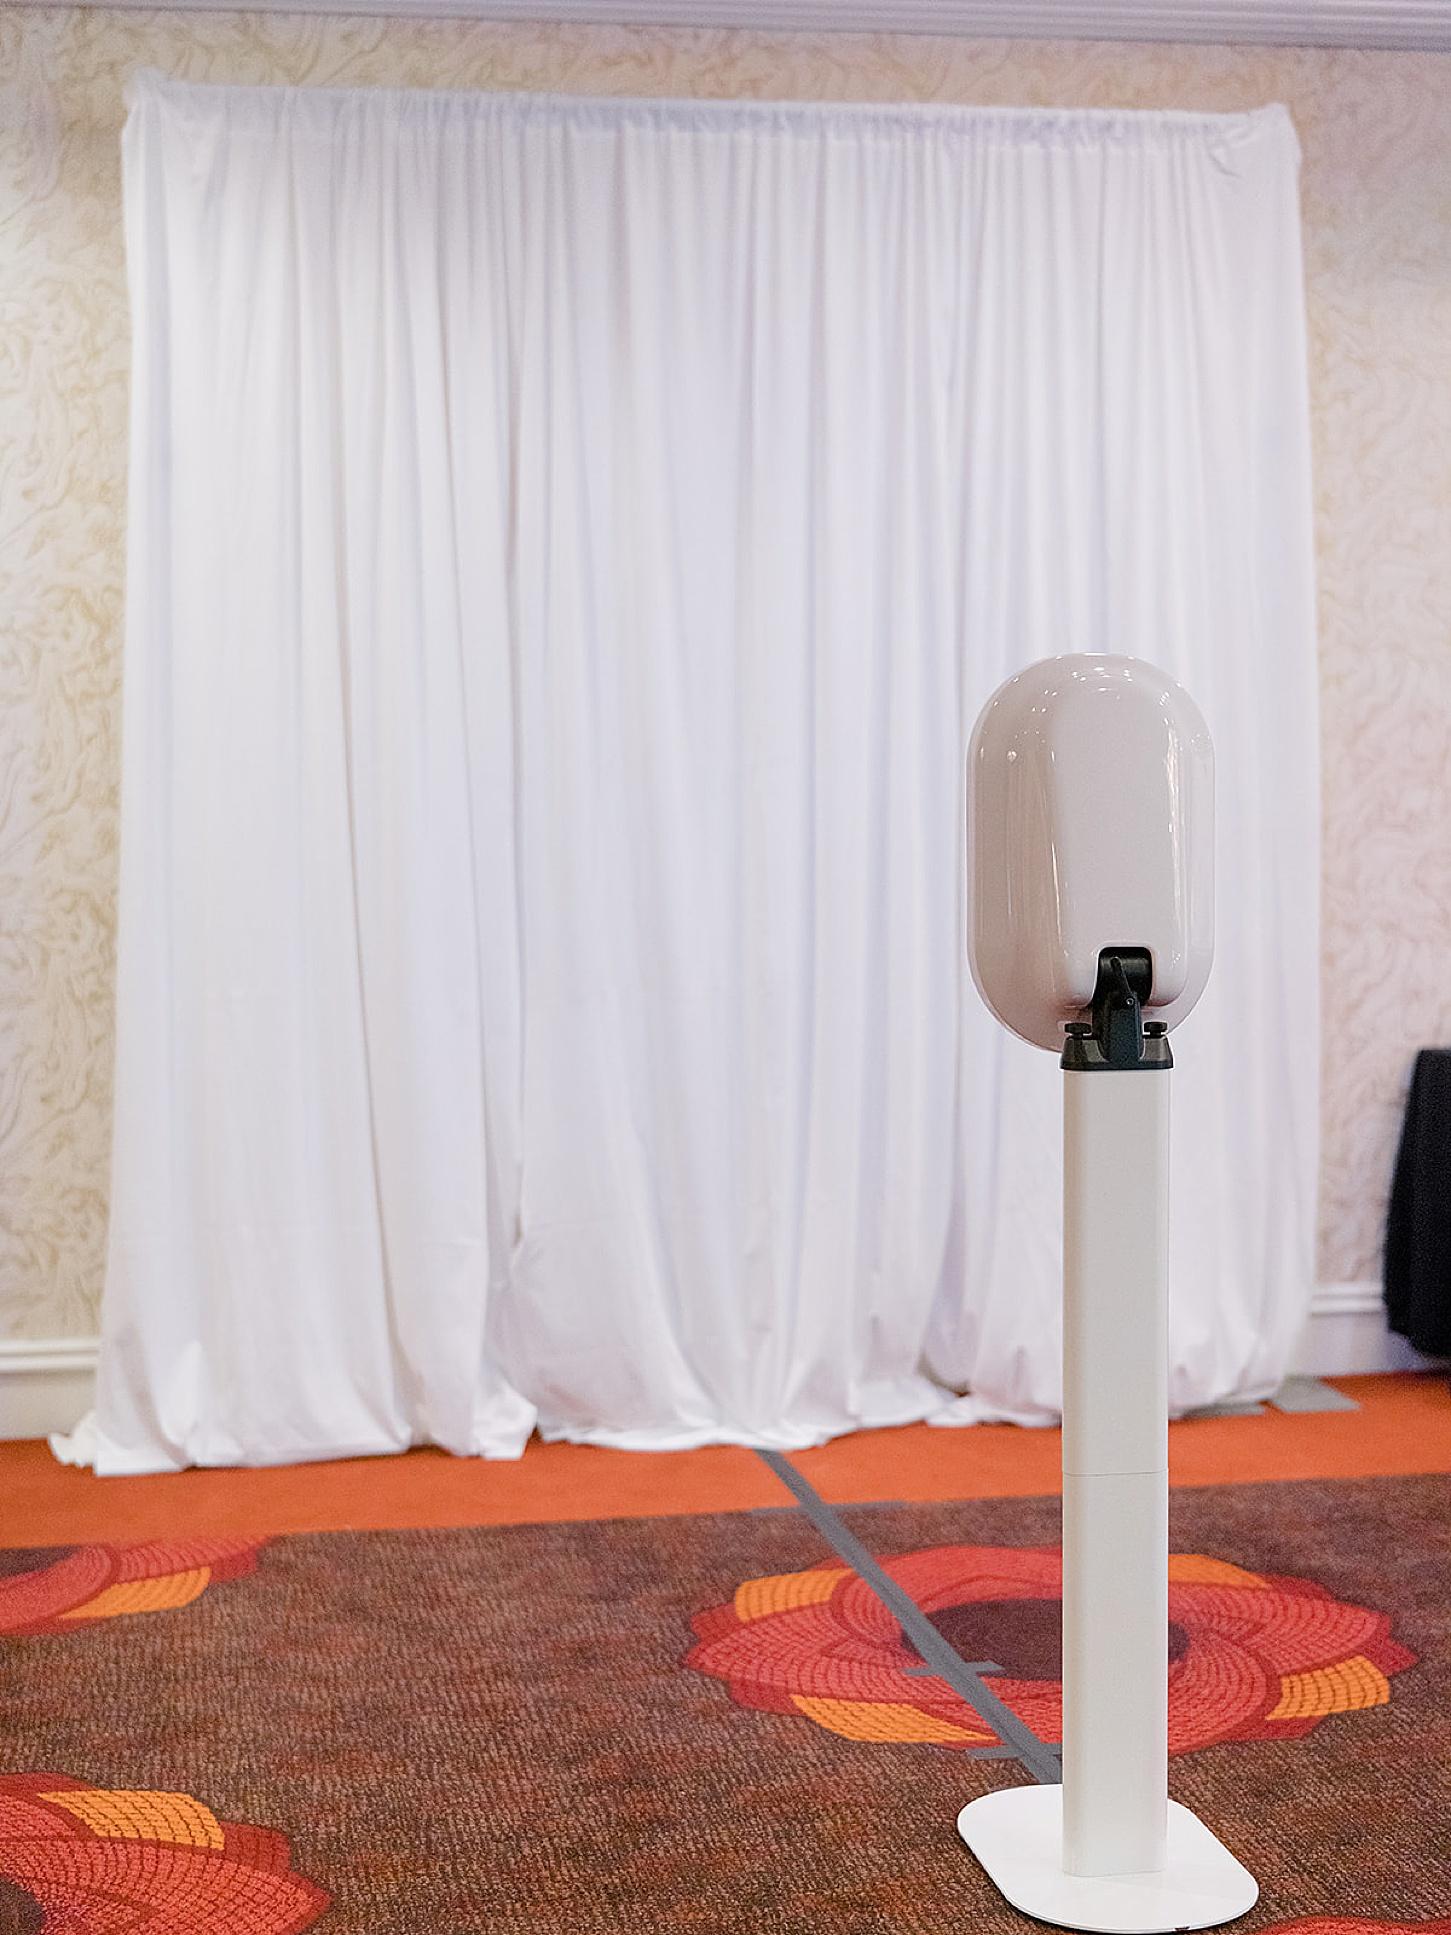 Atlantic City Wedding Photography Studio by Magdalena Studios Lexy Cha 0094